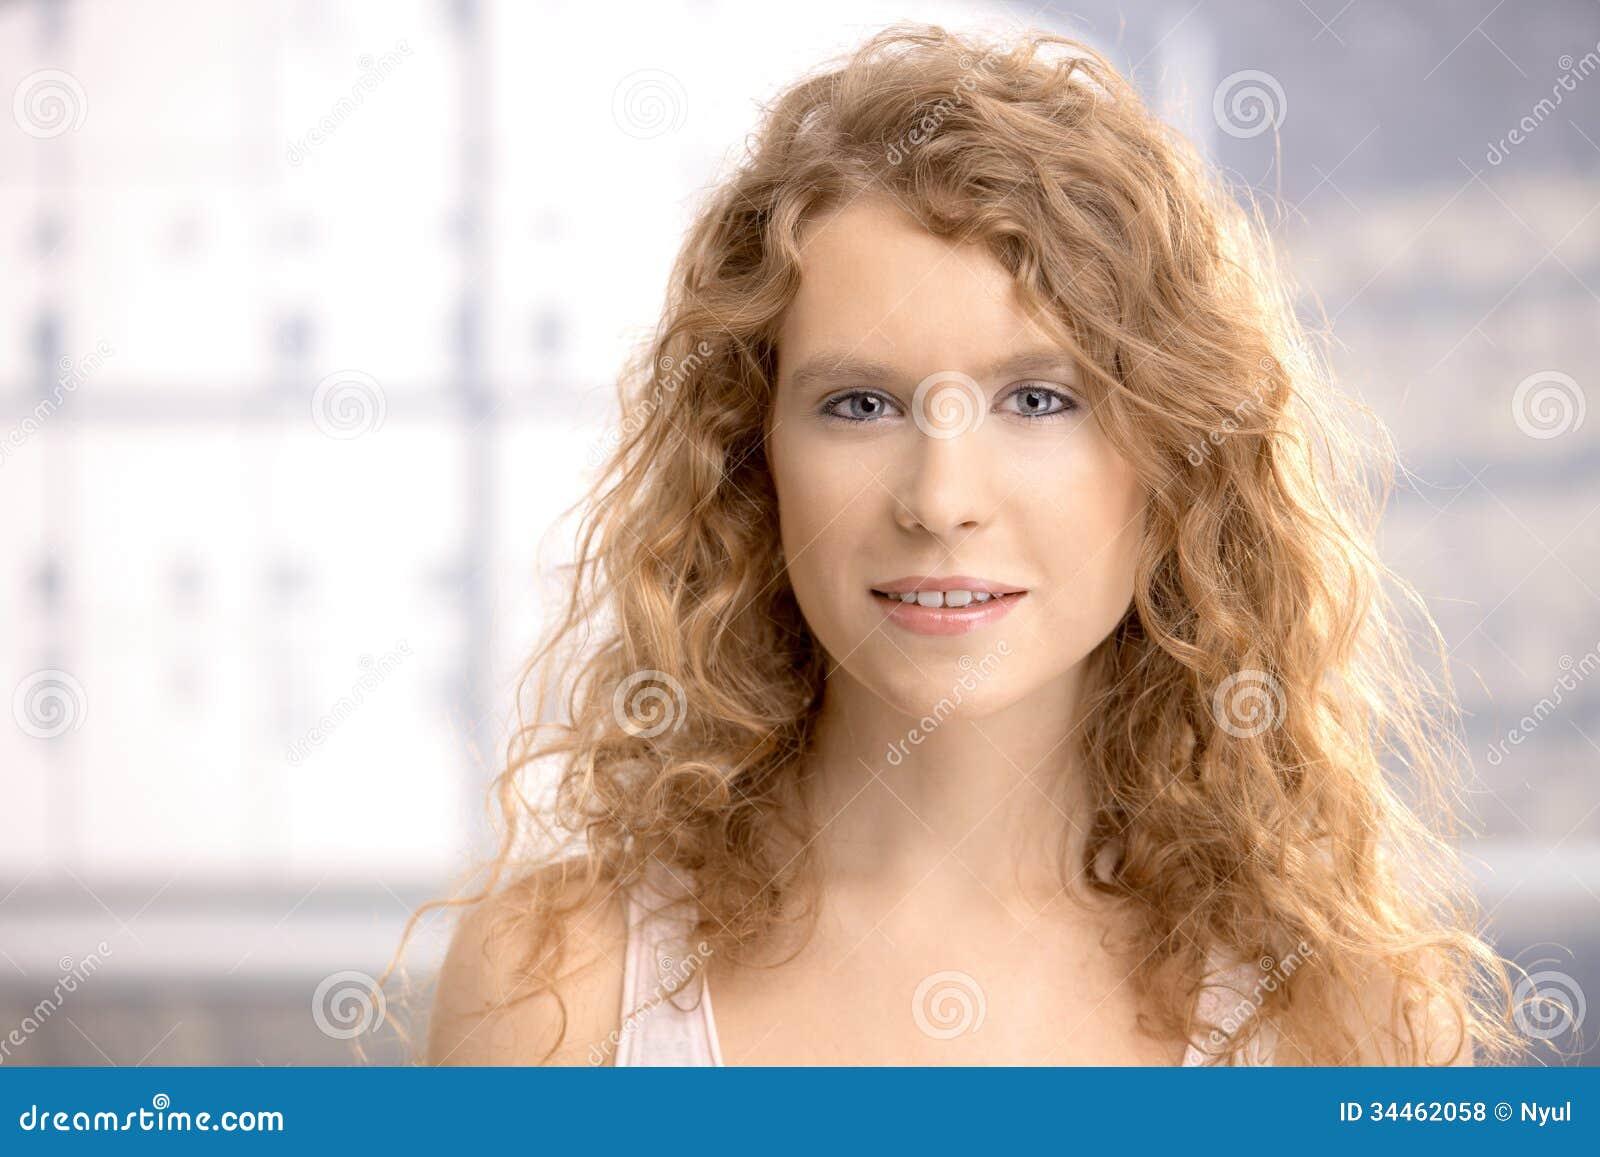 Women Blonde Blue Eyes Long Hair Wavy Hair Portrait: Portrait Of Pretty Girl Smiling Royalty Free Stock Photos